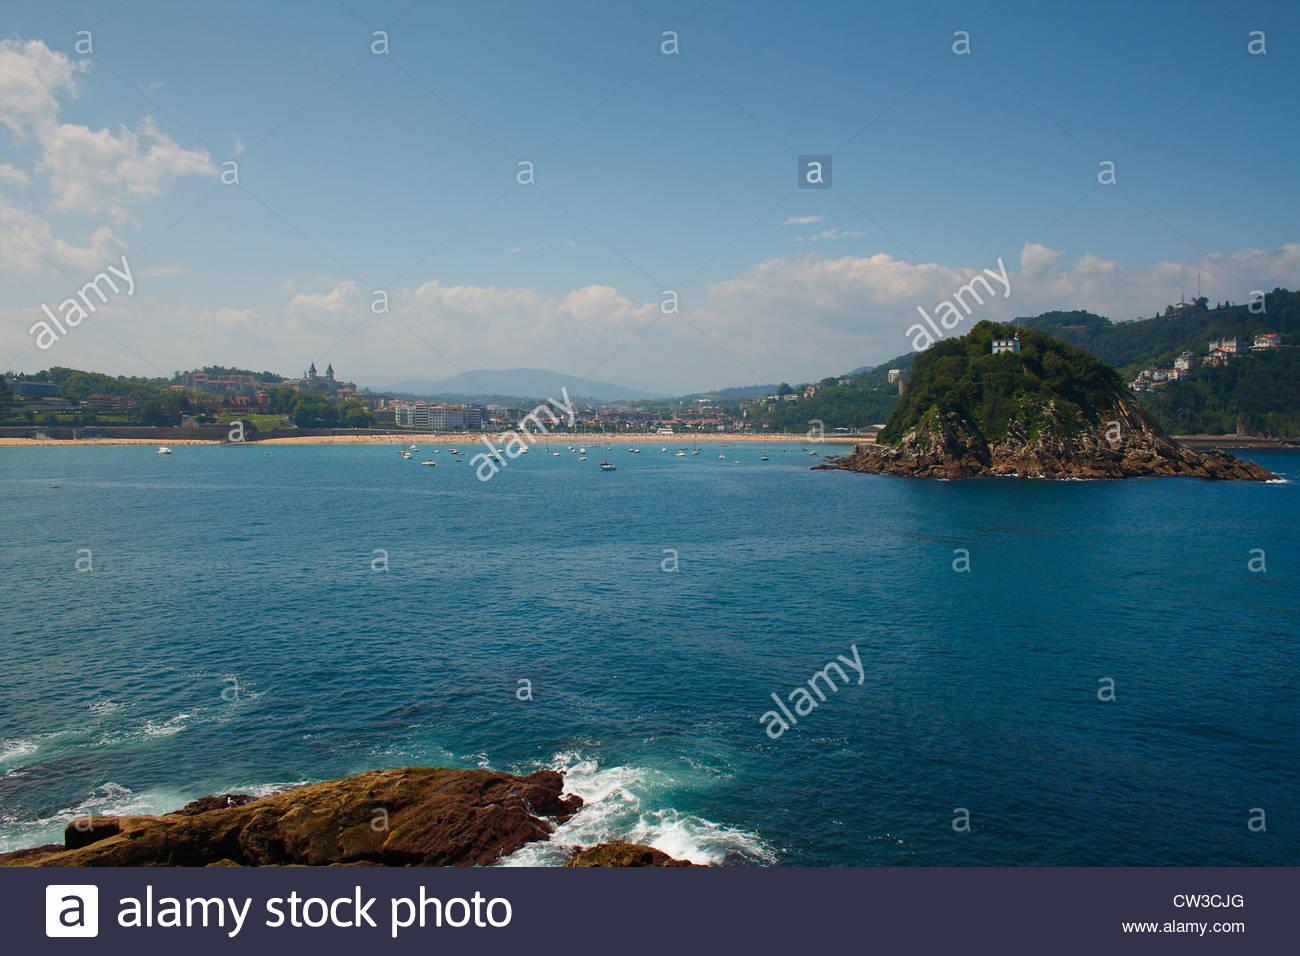 Bahia, de San Sebastian - Donosti, in Guipuzcoa - guipuzkoa, Basque Country, Spain. - Stock Image